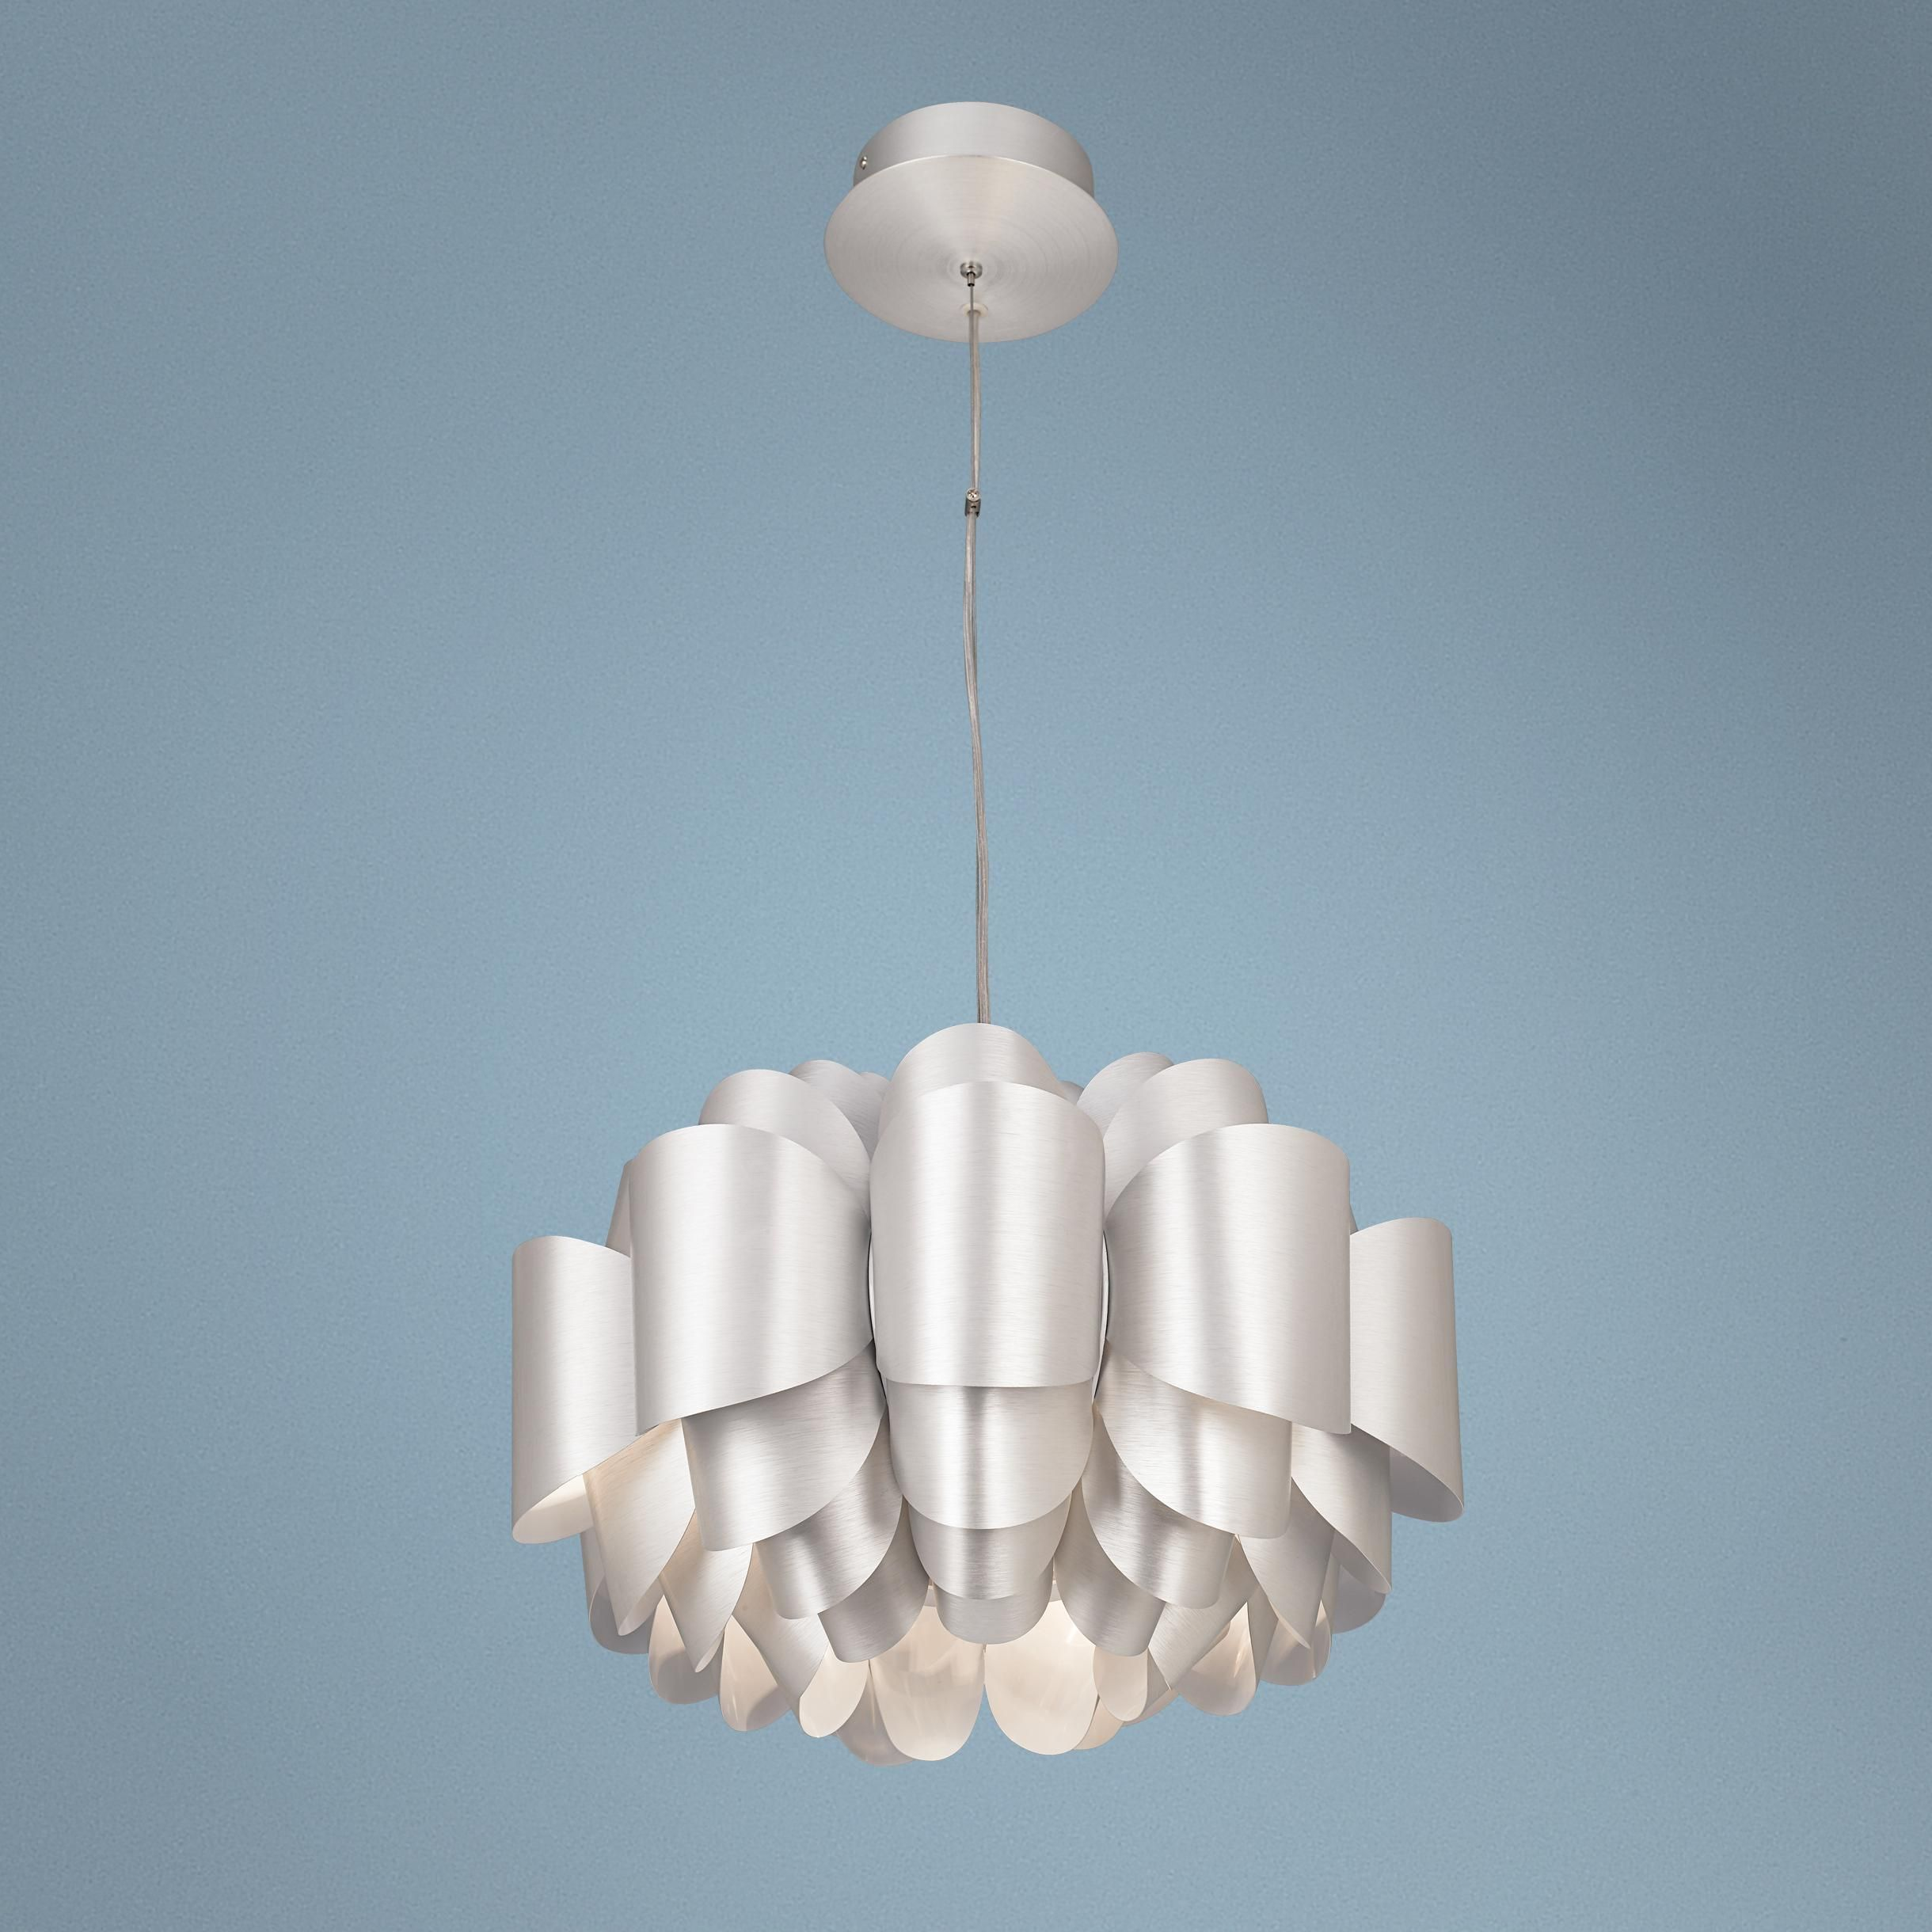 Euro Chandelier Lighting: Dining Room Chandelier Possini Euro Design Aluminum Lotus